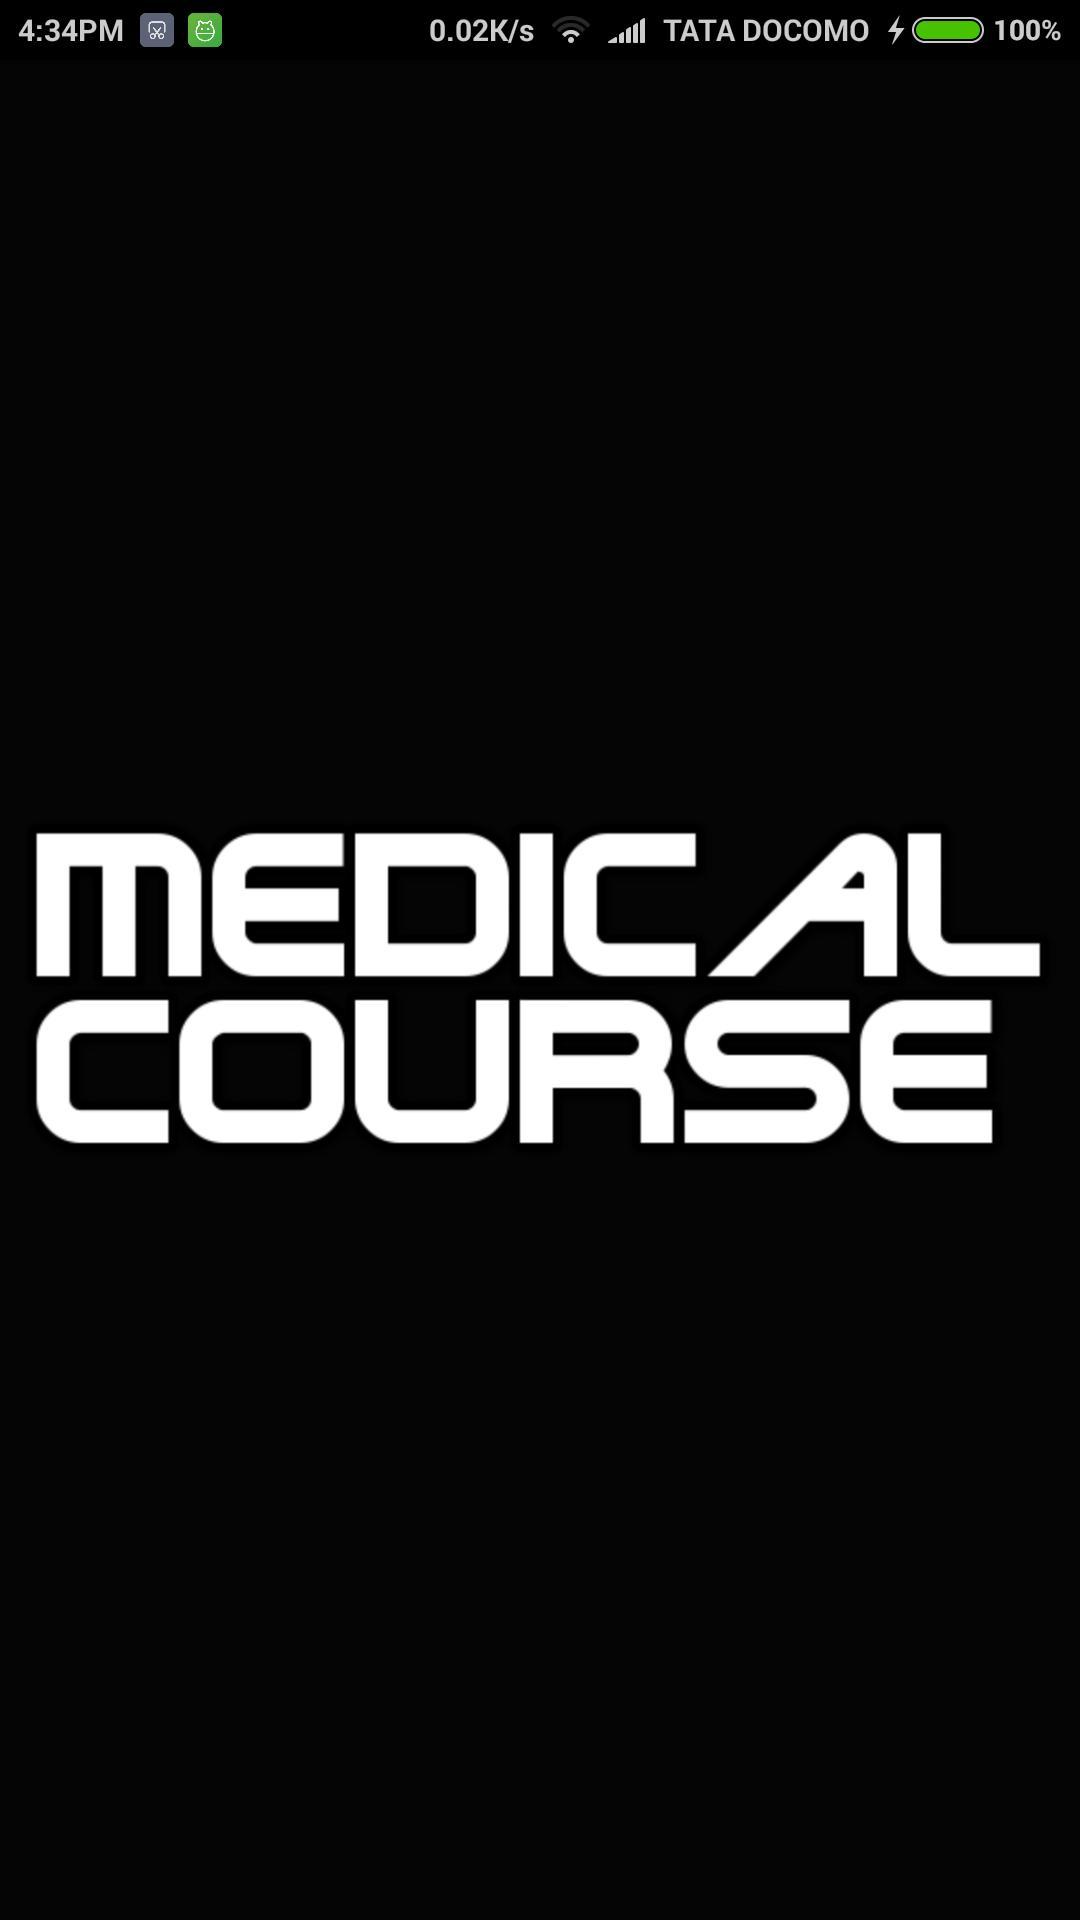 Medical Course screenshot 1